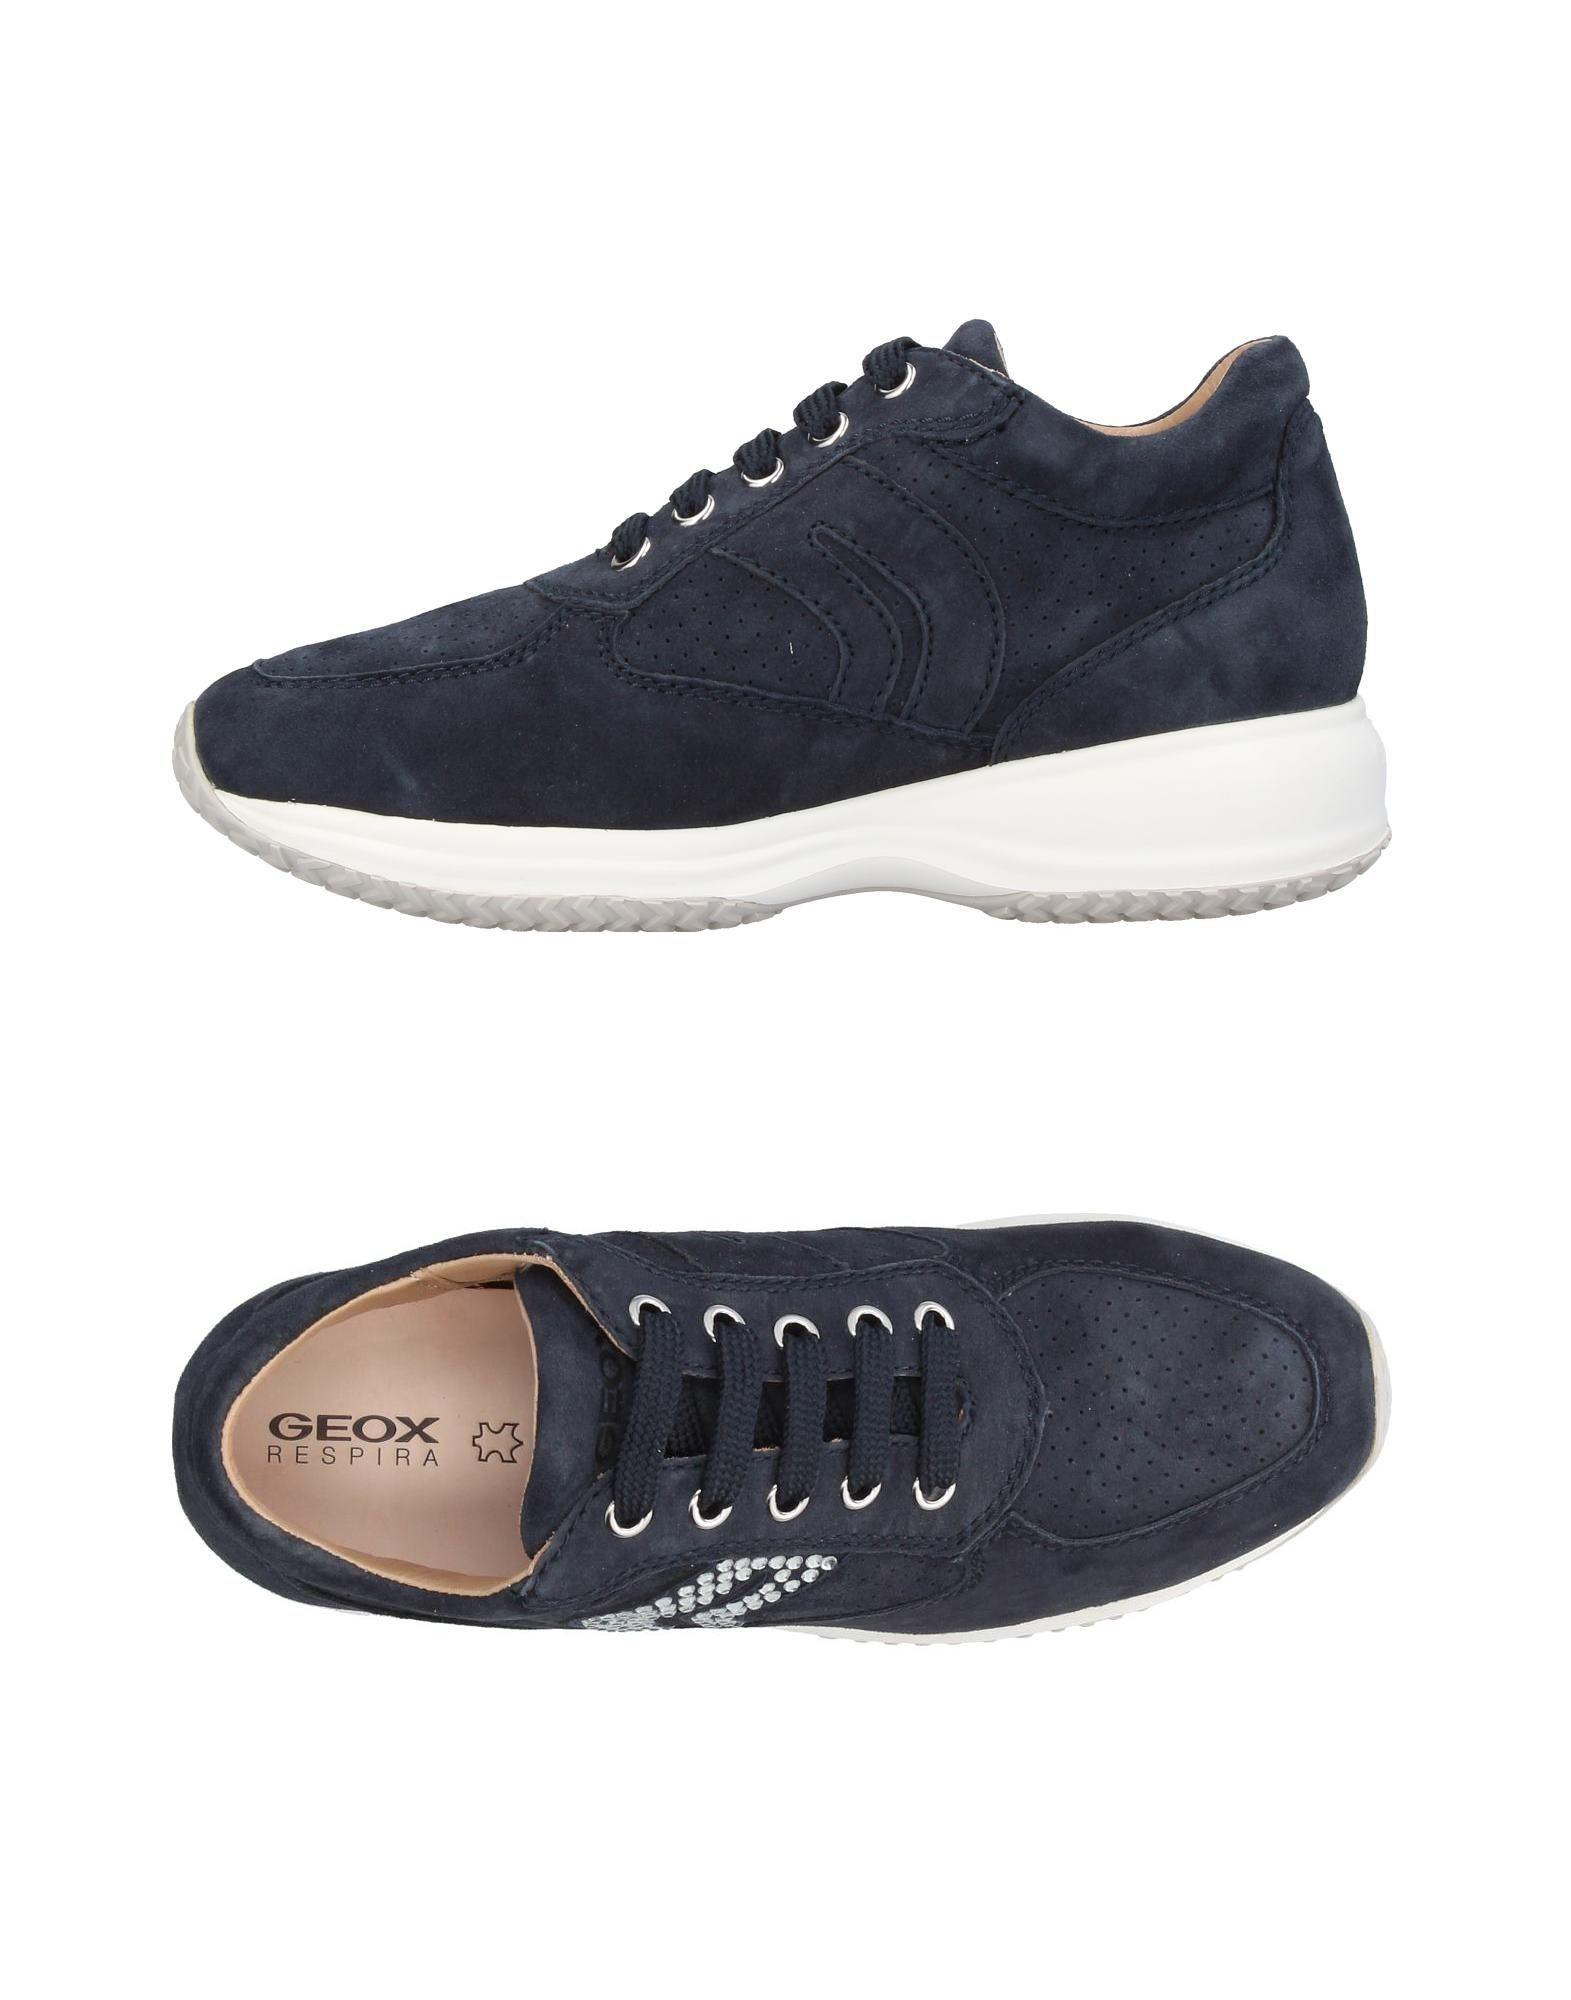 Geox Bas-tops Et Chaussures De Sport wl2Wt